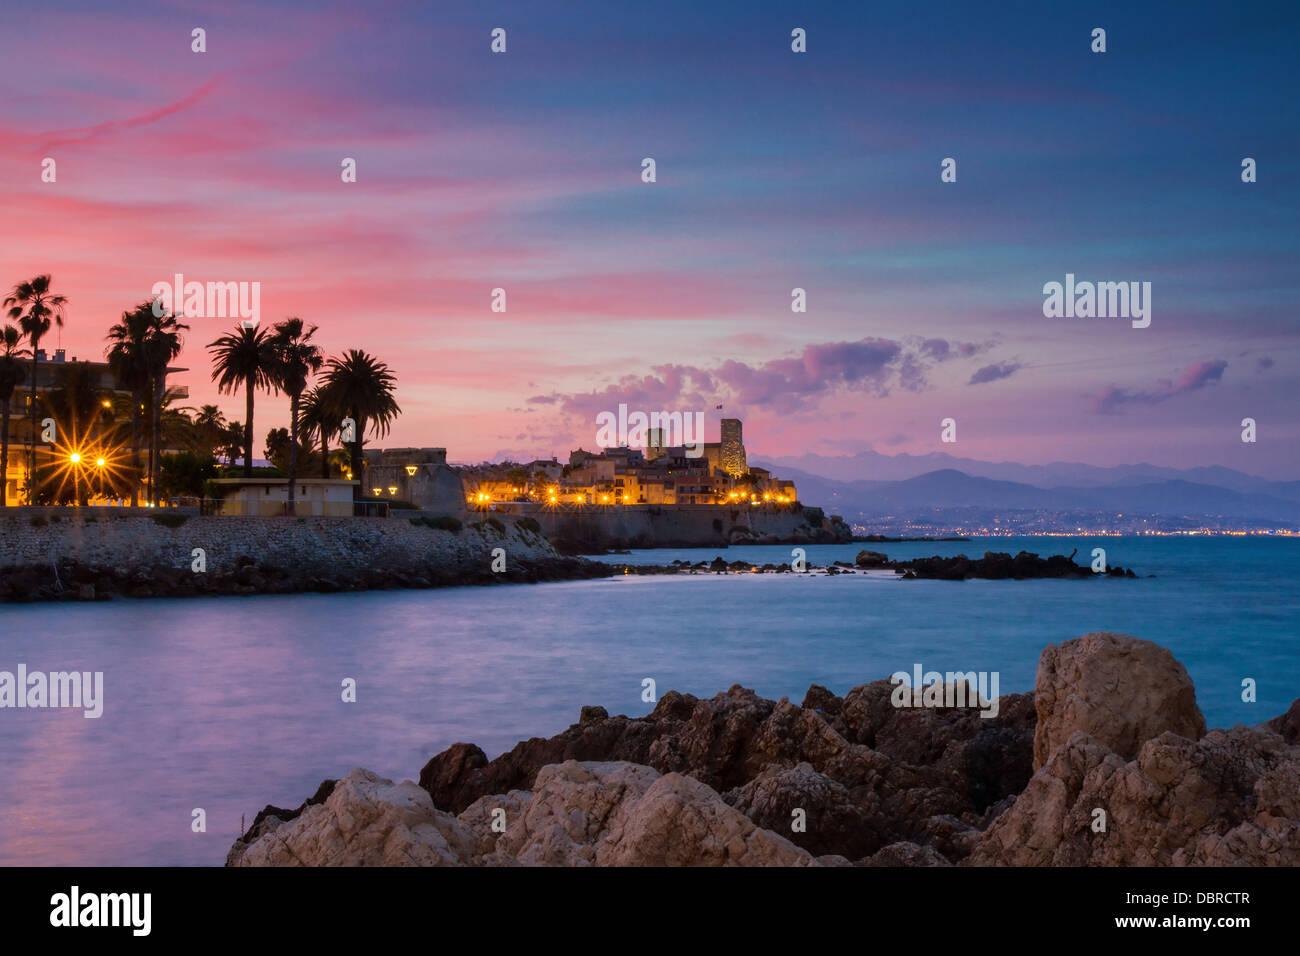 Marin d'Antibes au coucher du soleil, Provence, France Photo Stock